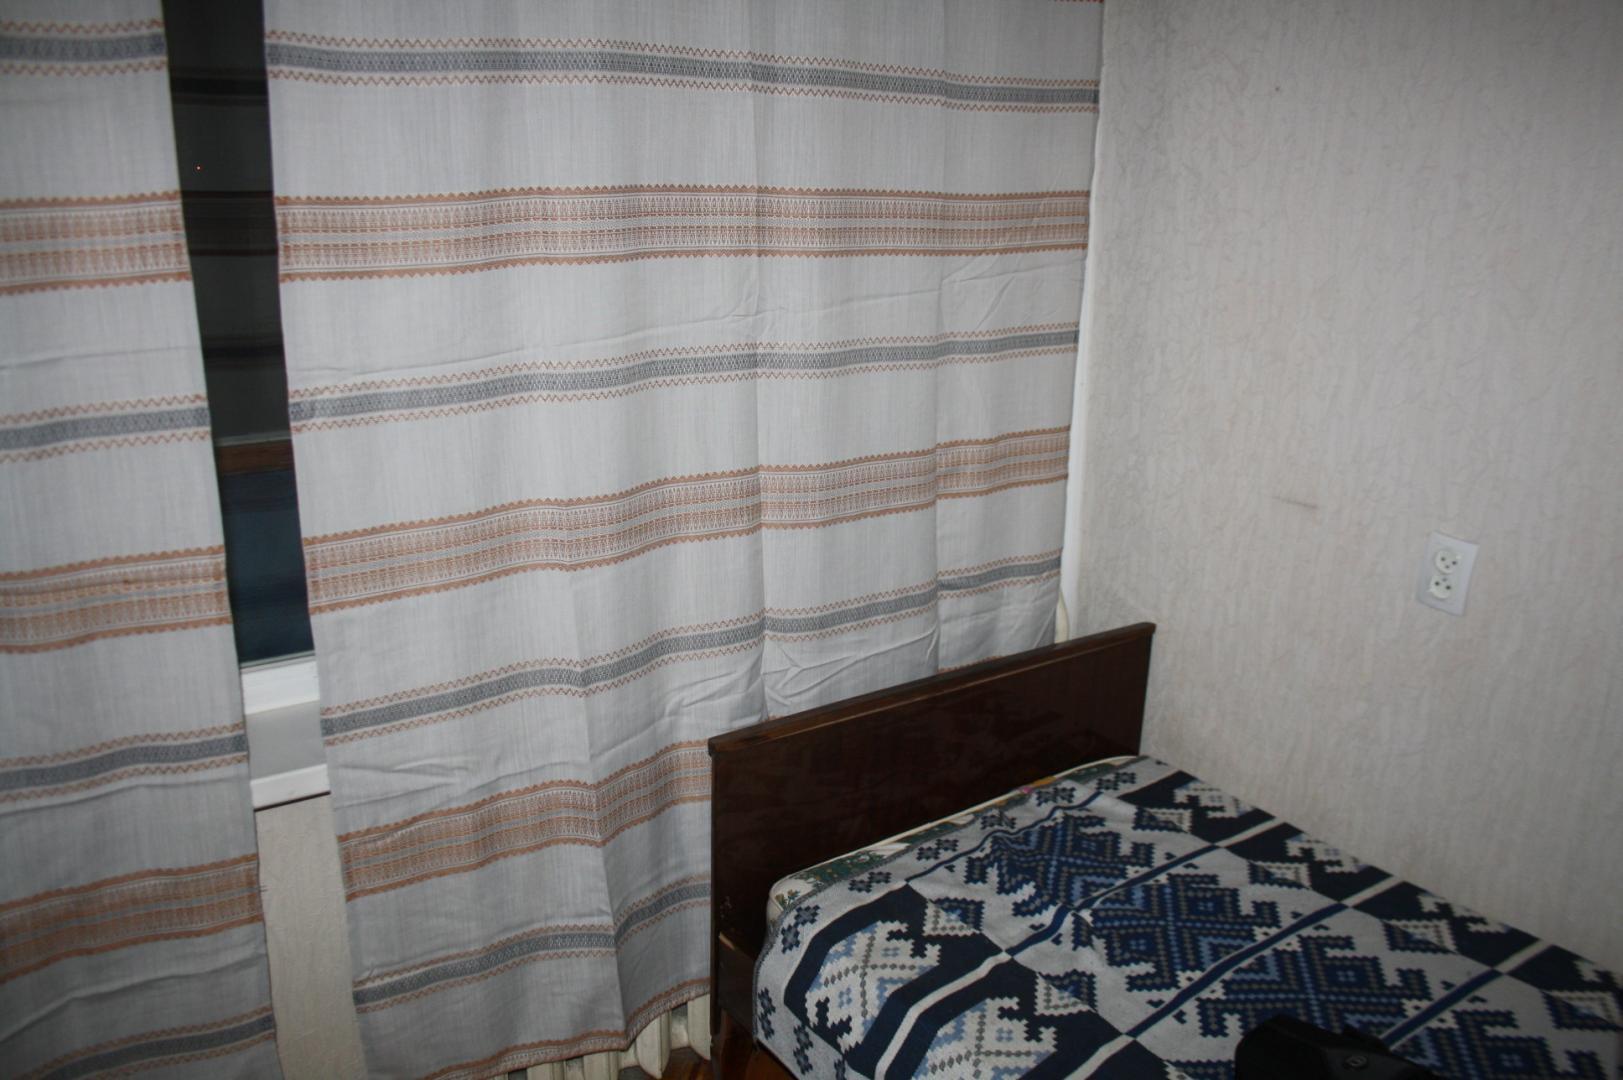 Квартира, 1 комната, 35 м² в Люберцах 89160792833 купить 9